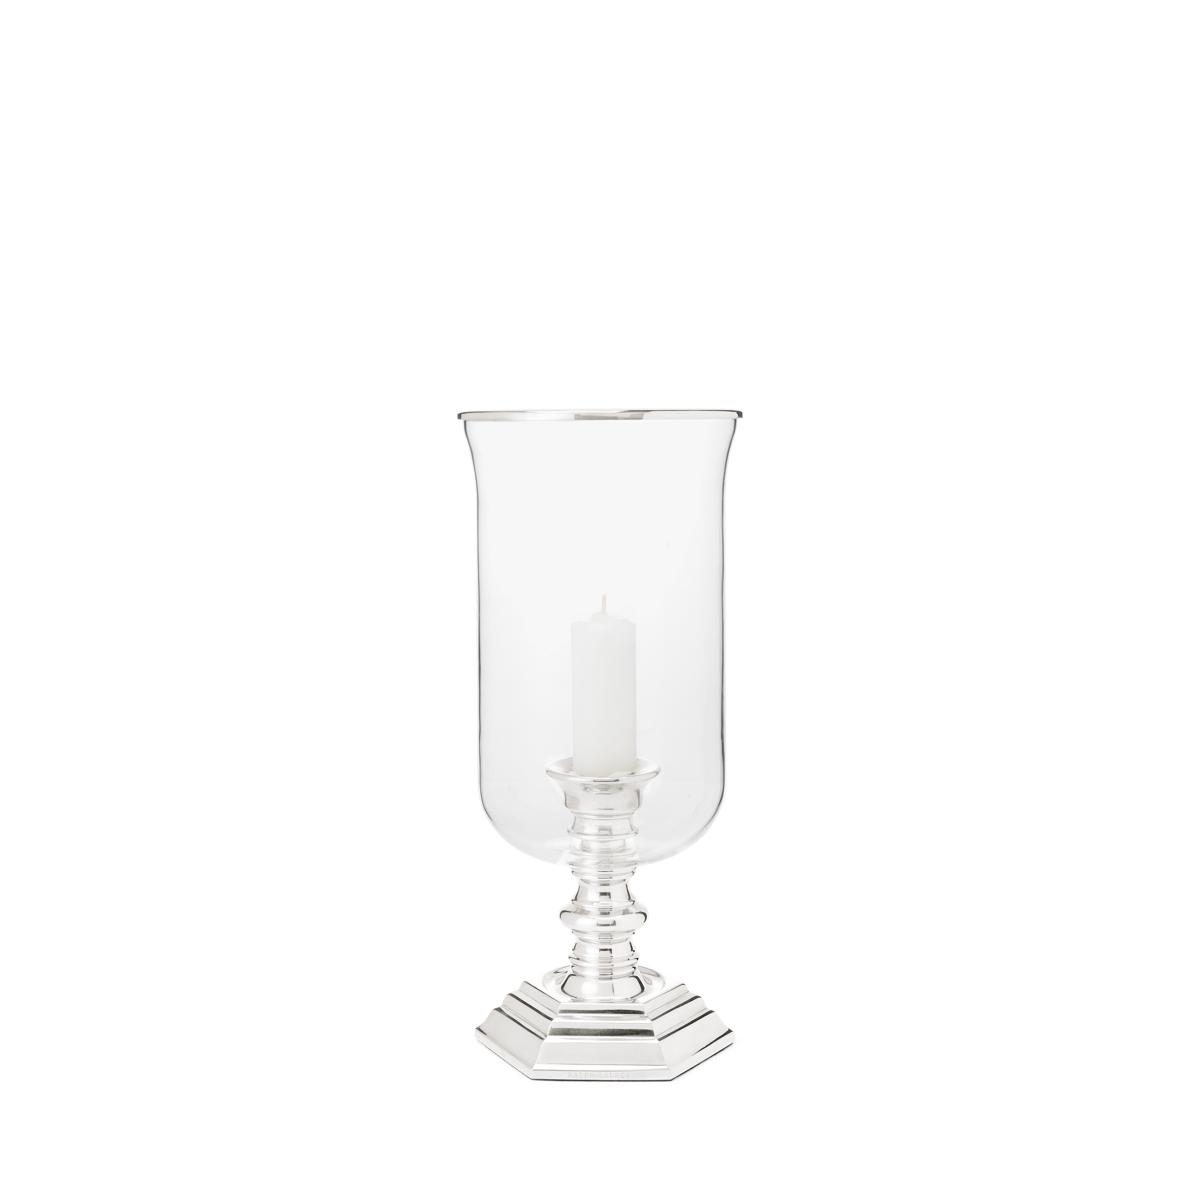 Vases Candle Holders Home Ralph Lauren